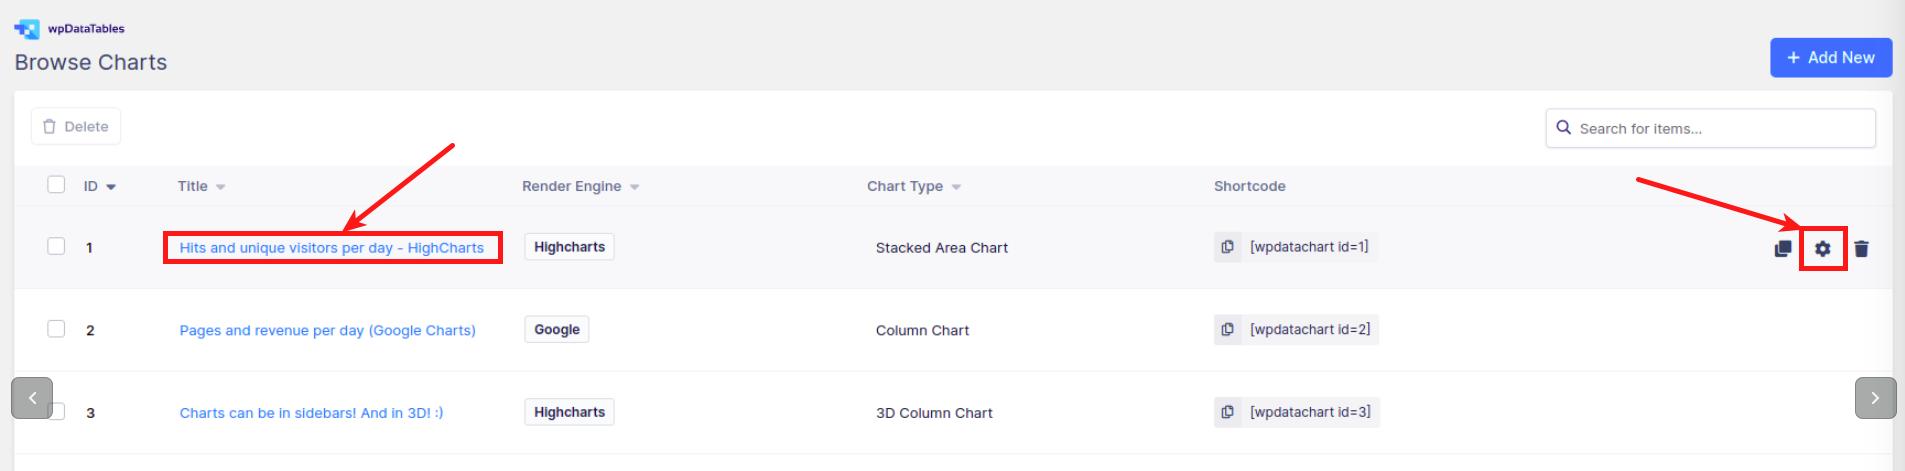 Configure charts in WordPress